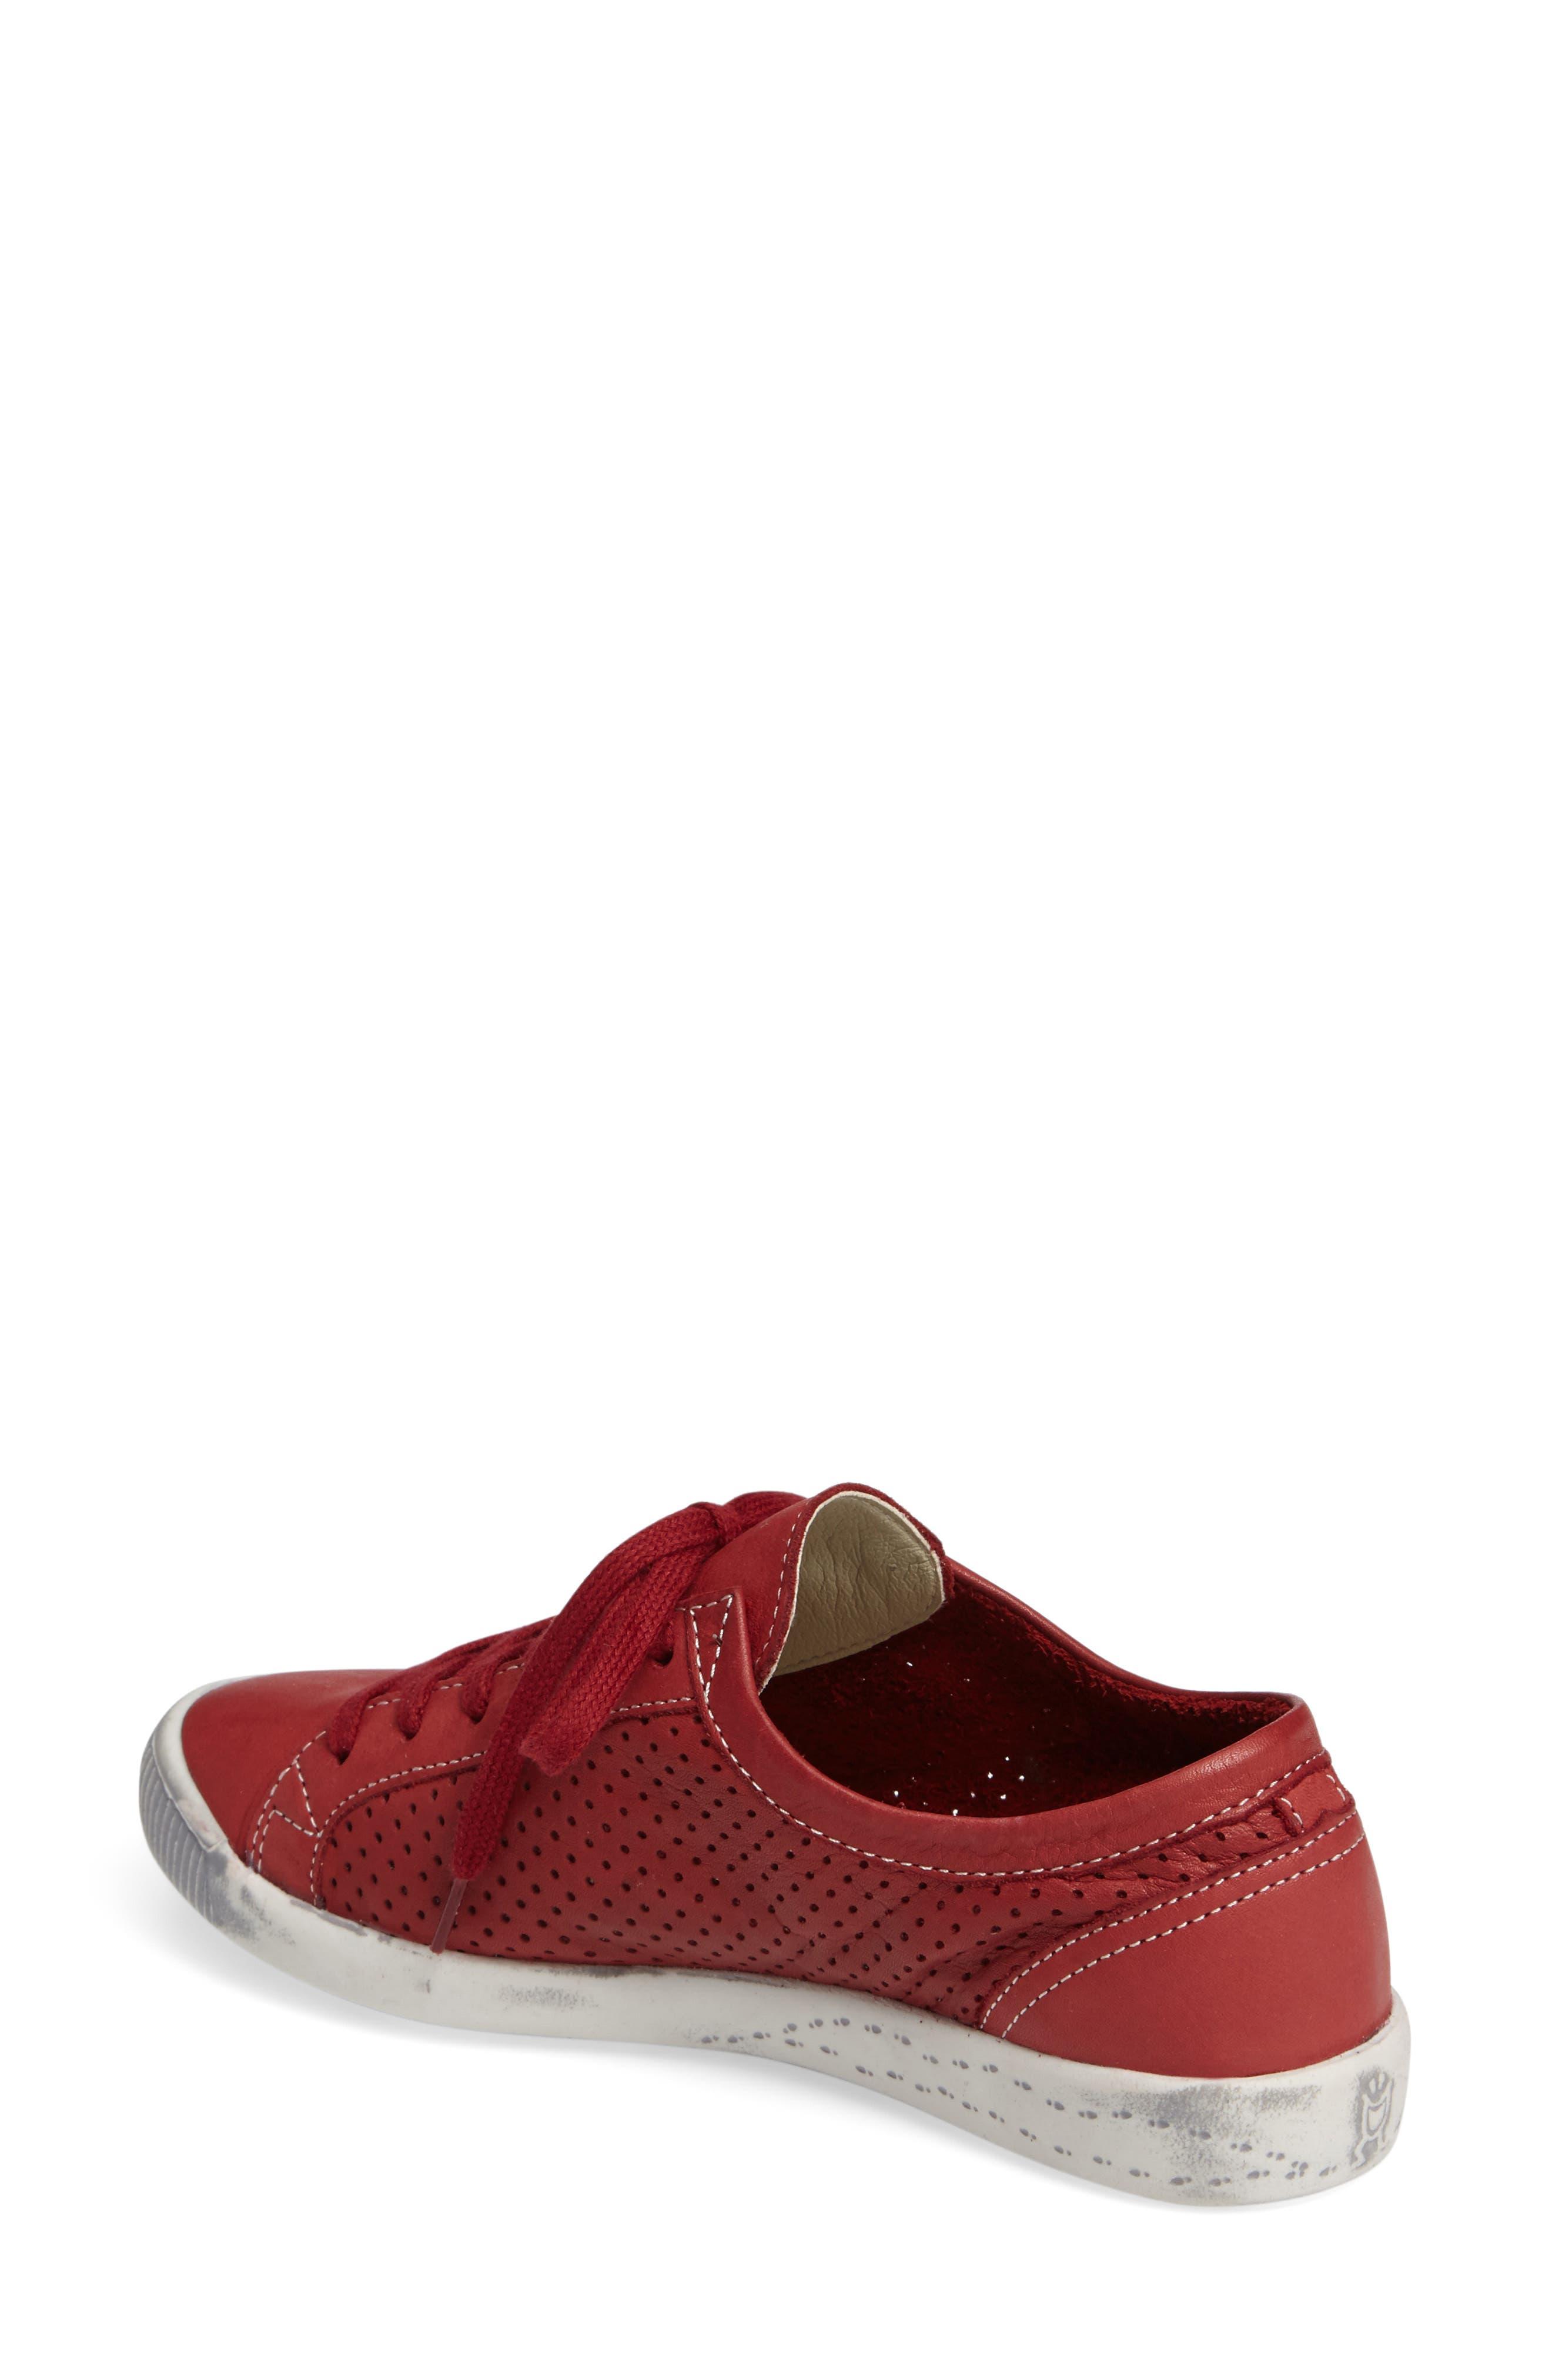 Ica Sneaker,                             Alternate thumbnail 16, color,